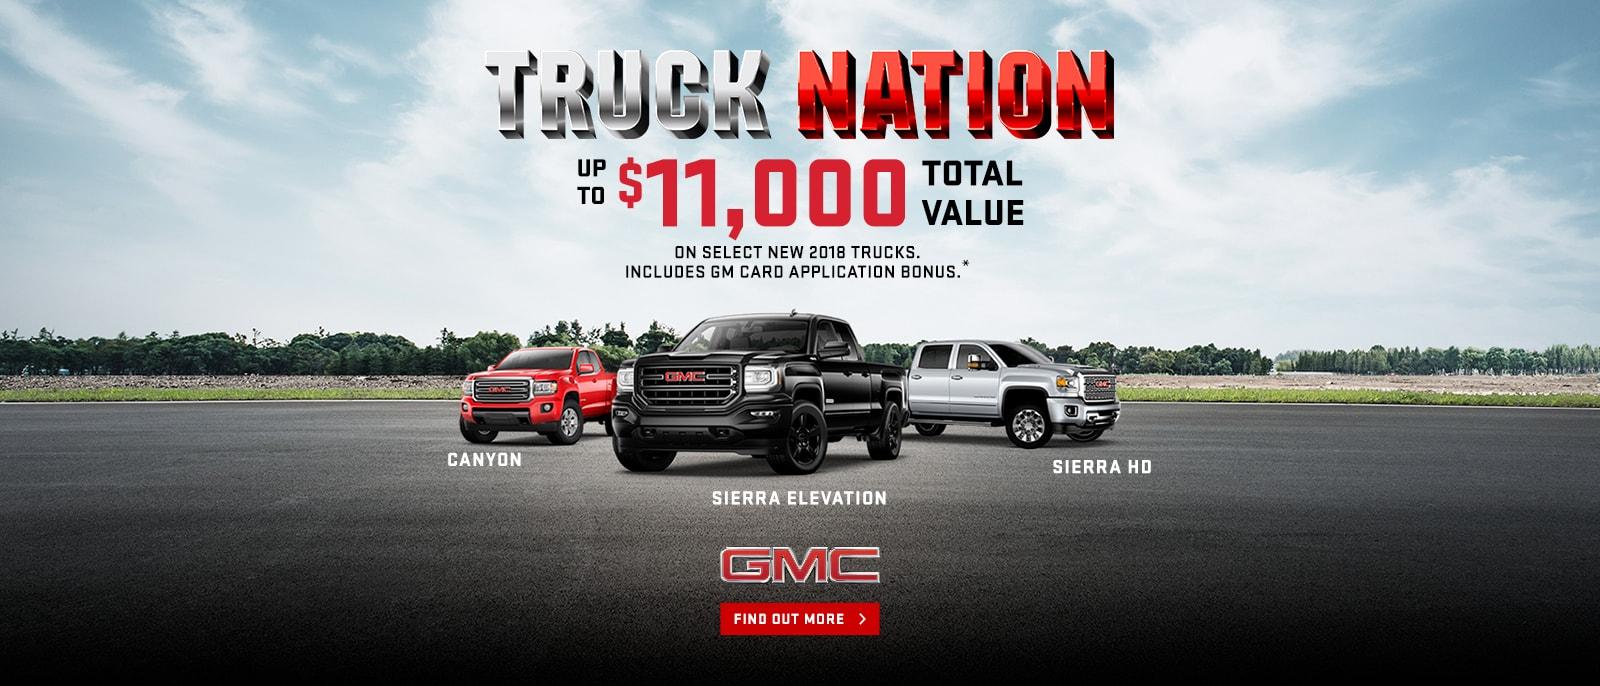 Truck-Specials-GMC-Sierra-Canyon-Truck-Month-Discount-Sale-Ajax-Pickering-Whitby-Oshawa-Clarington-Durham-Region-Toronto-Ontario-VanDusen